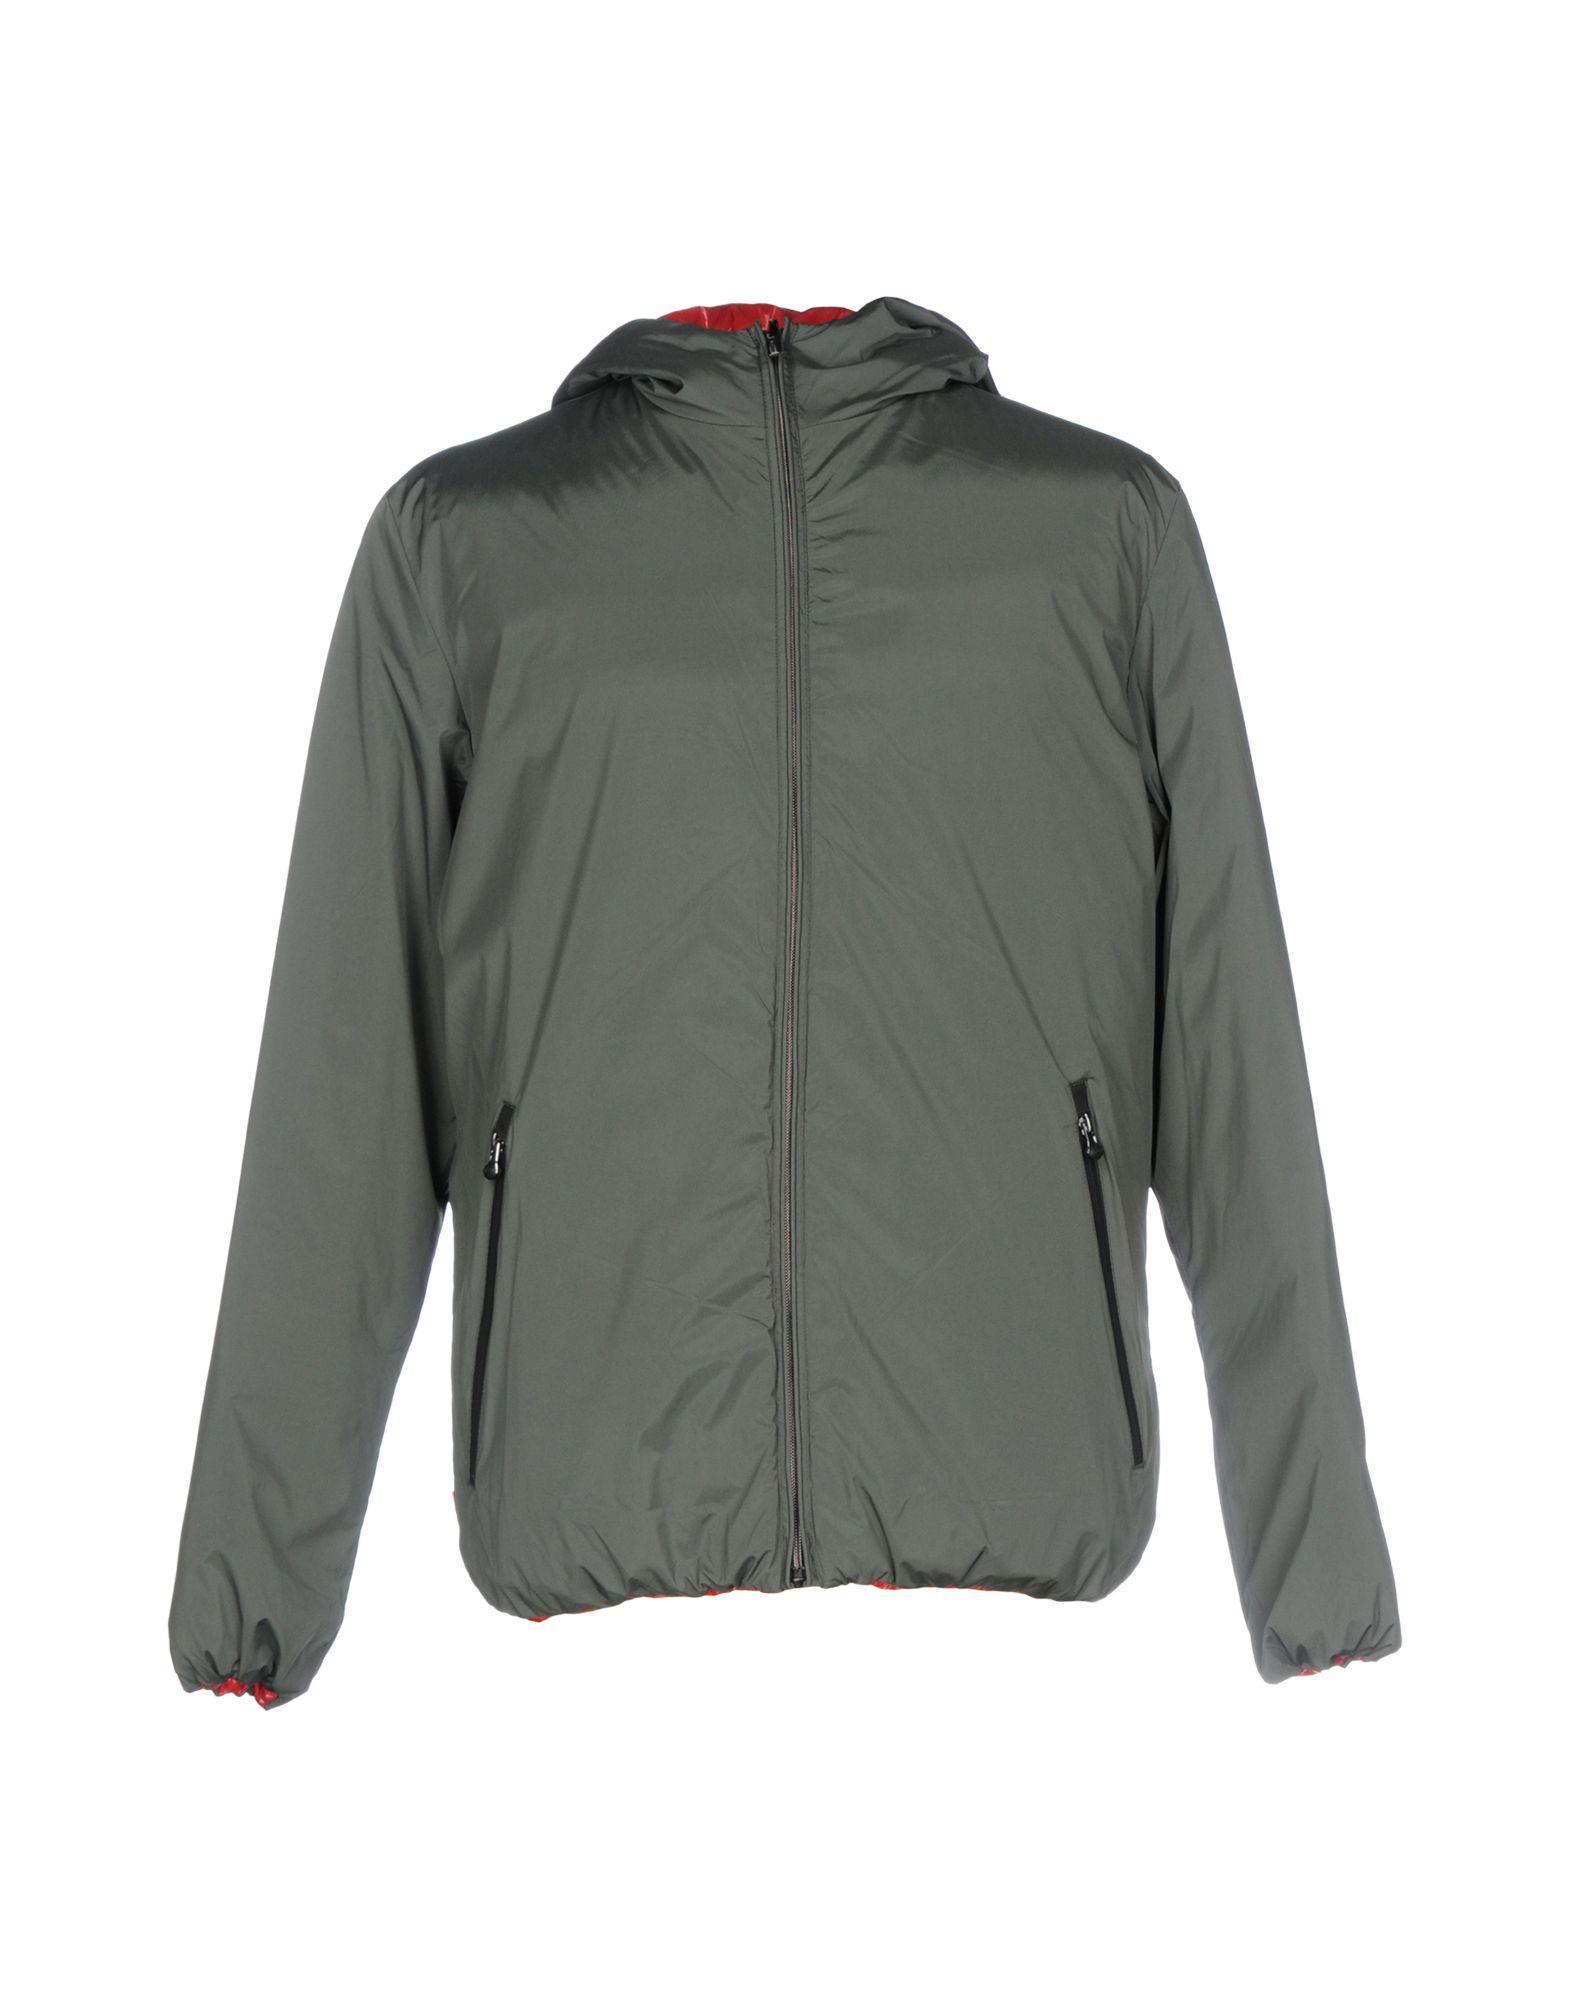 Rrd Down Jacket In Dark Green